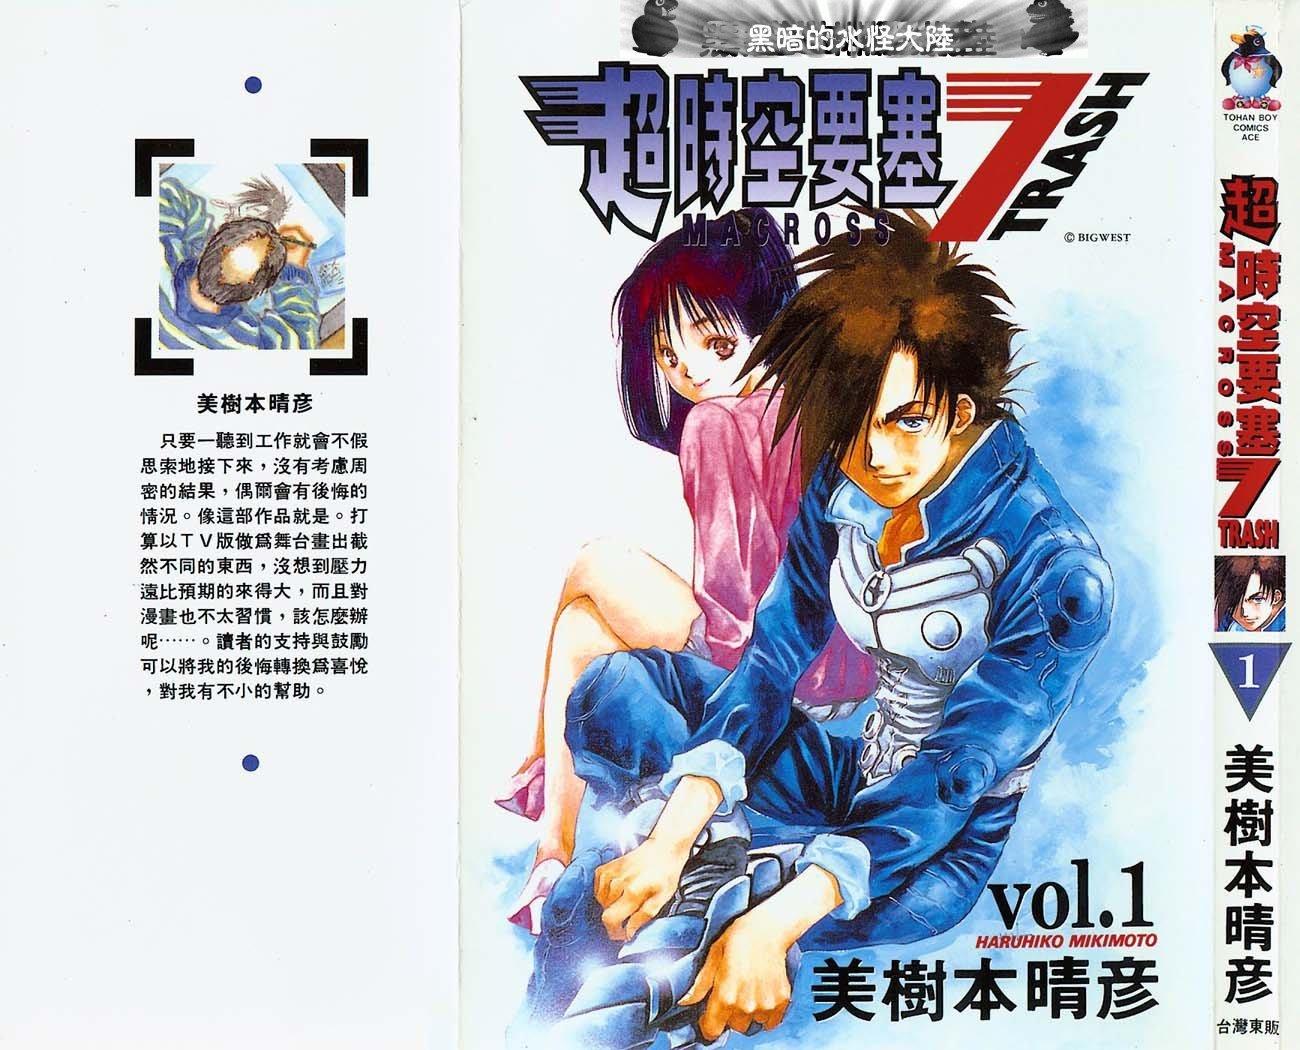 youku.com/show_page/id_zf453065c61ad11e0bea1